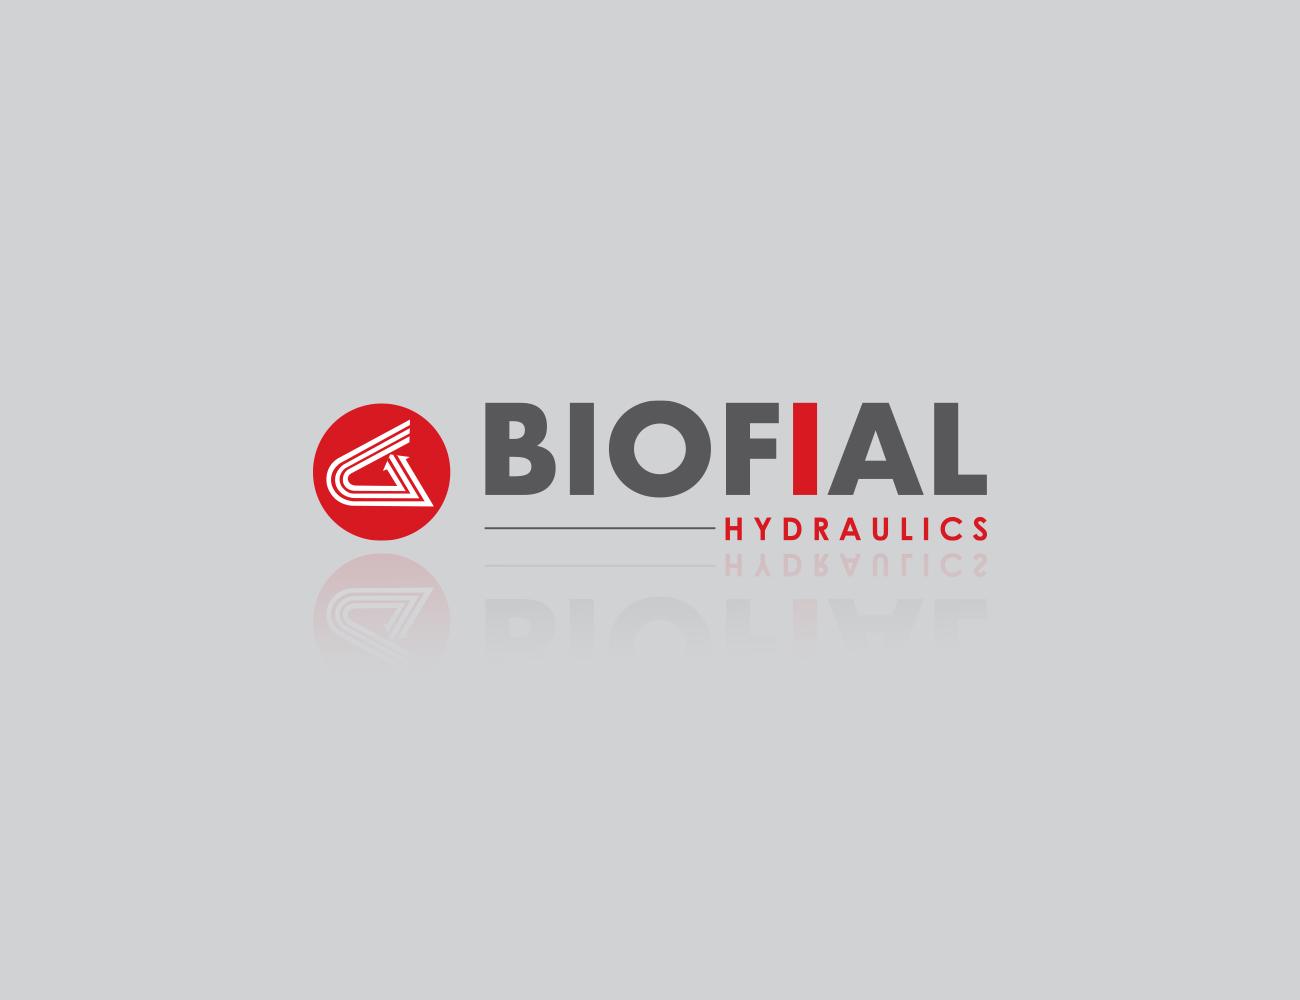 biofiallogodesign1